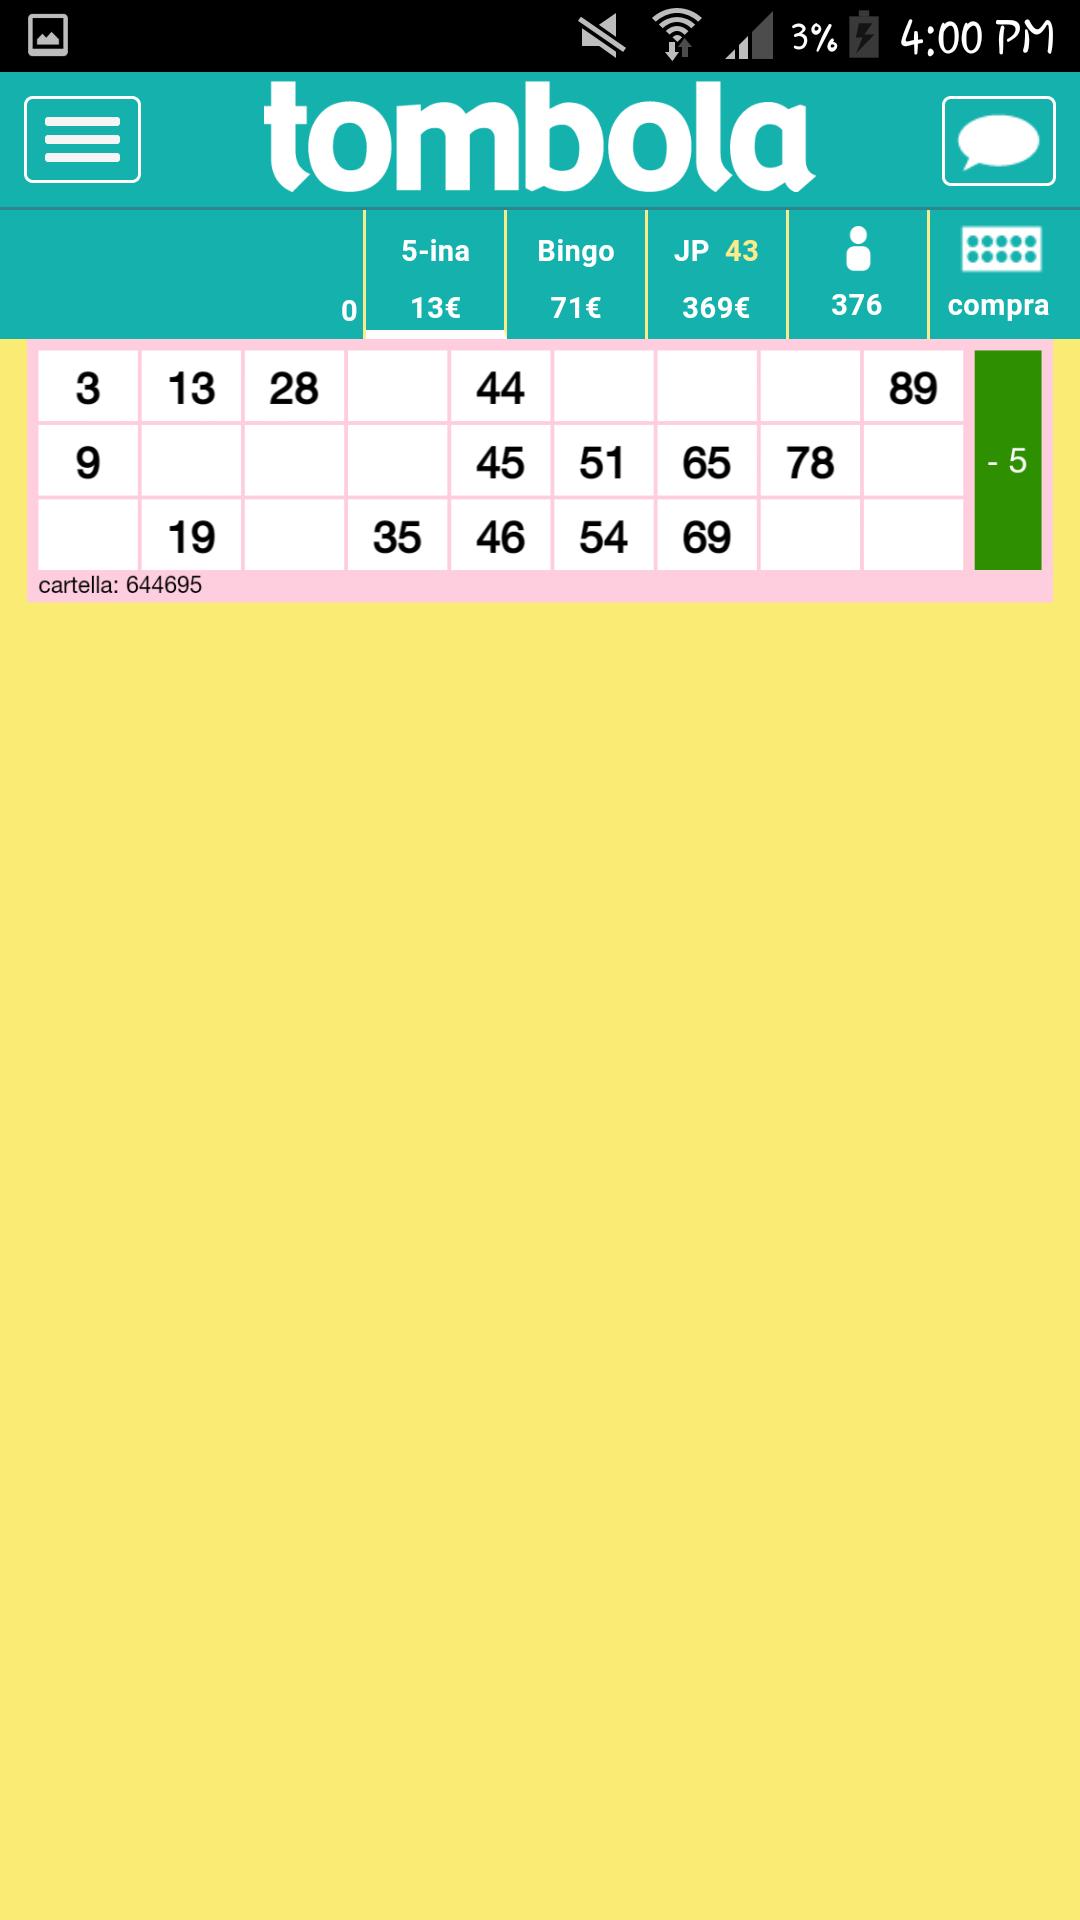 Partita del bingo